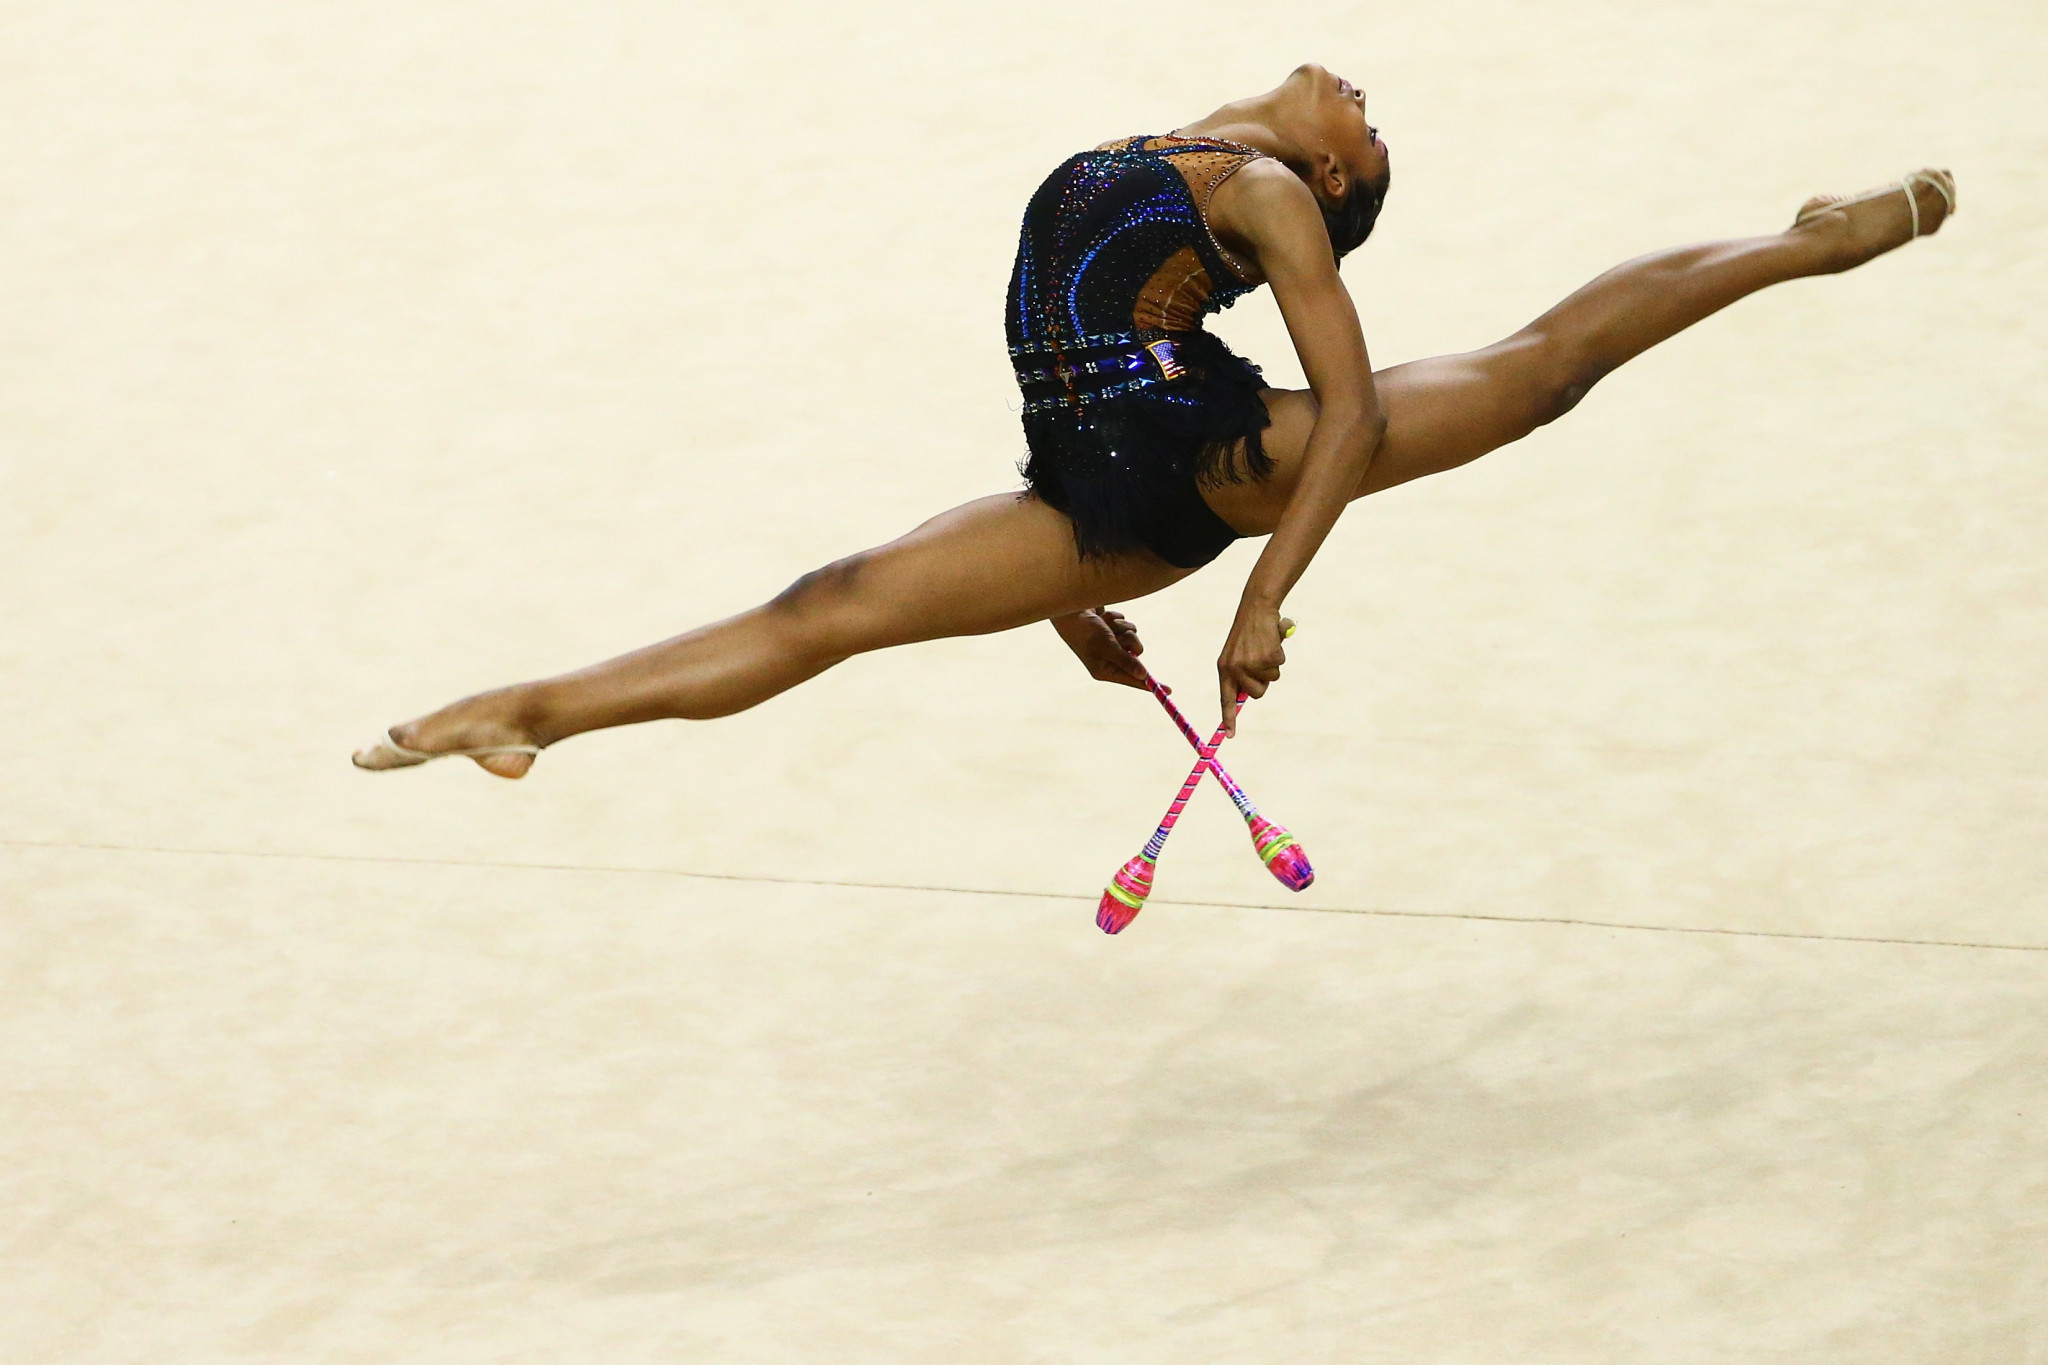 FIG Rhythmic Gymnastics World Cup season to resume in Tashkent